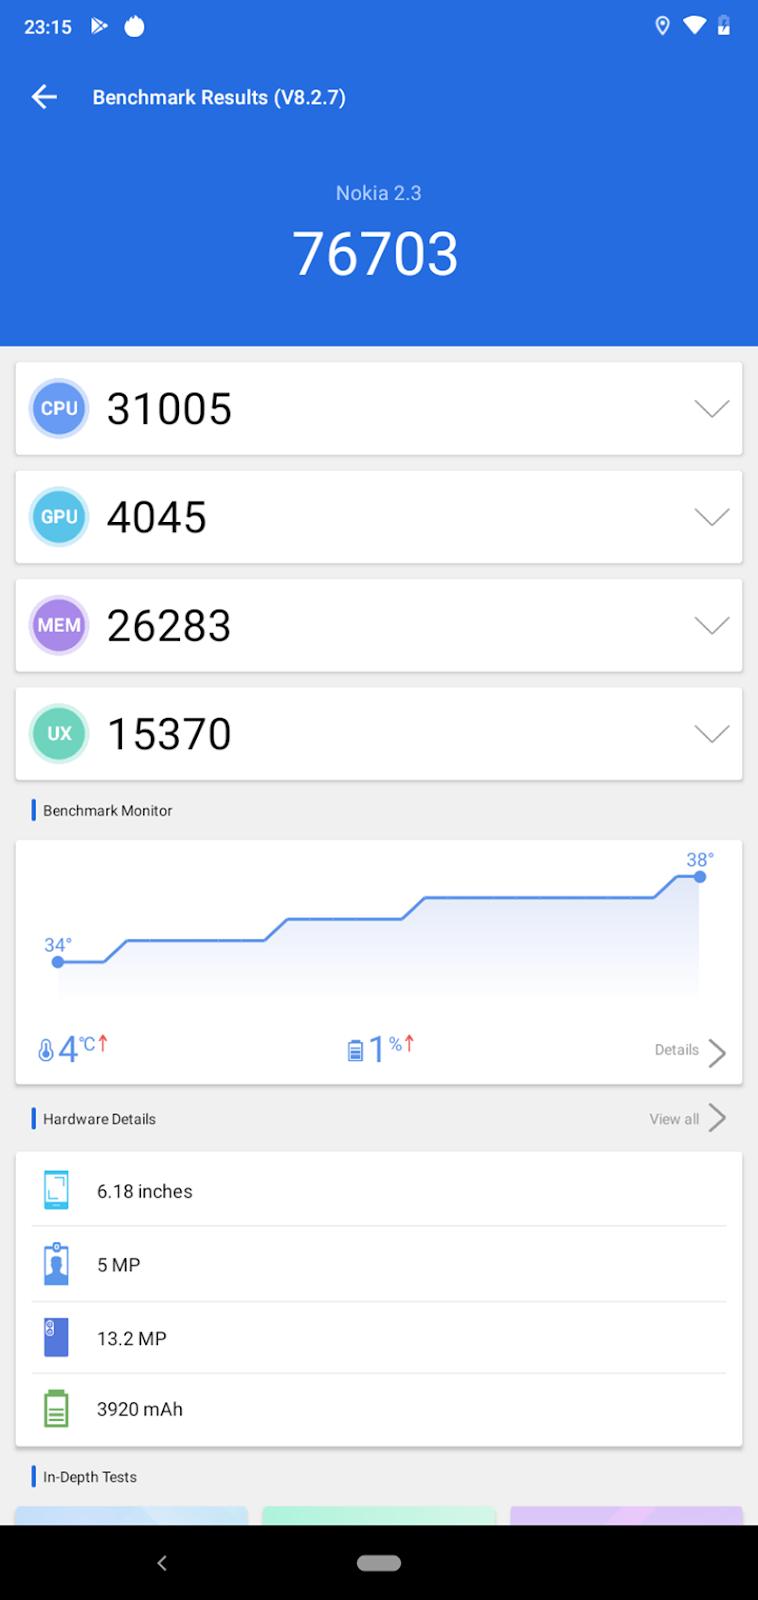 AnTuTu score of Nokia 2.3